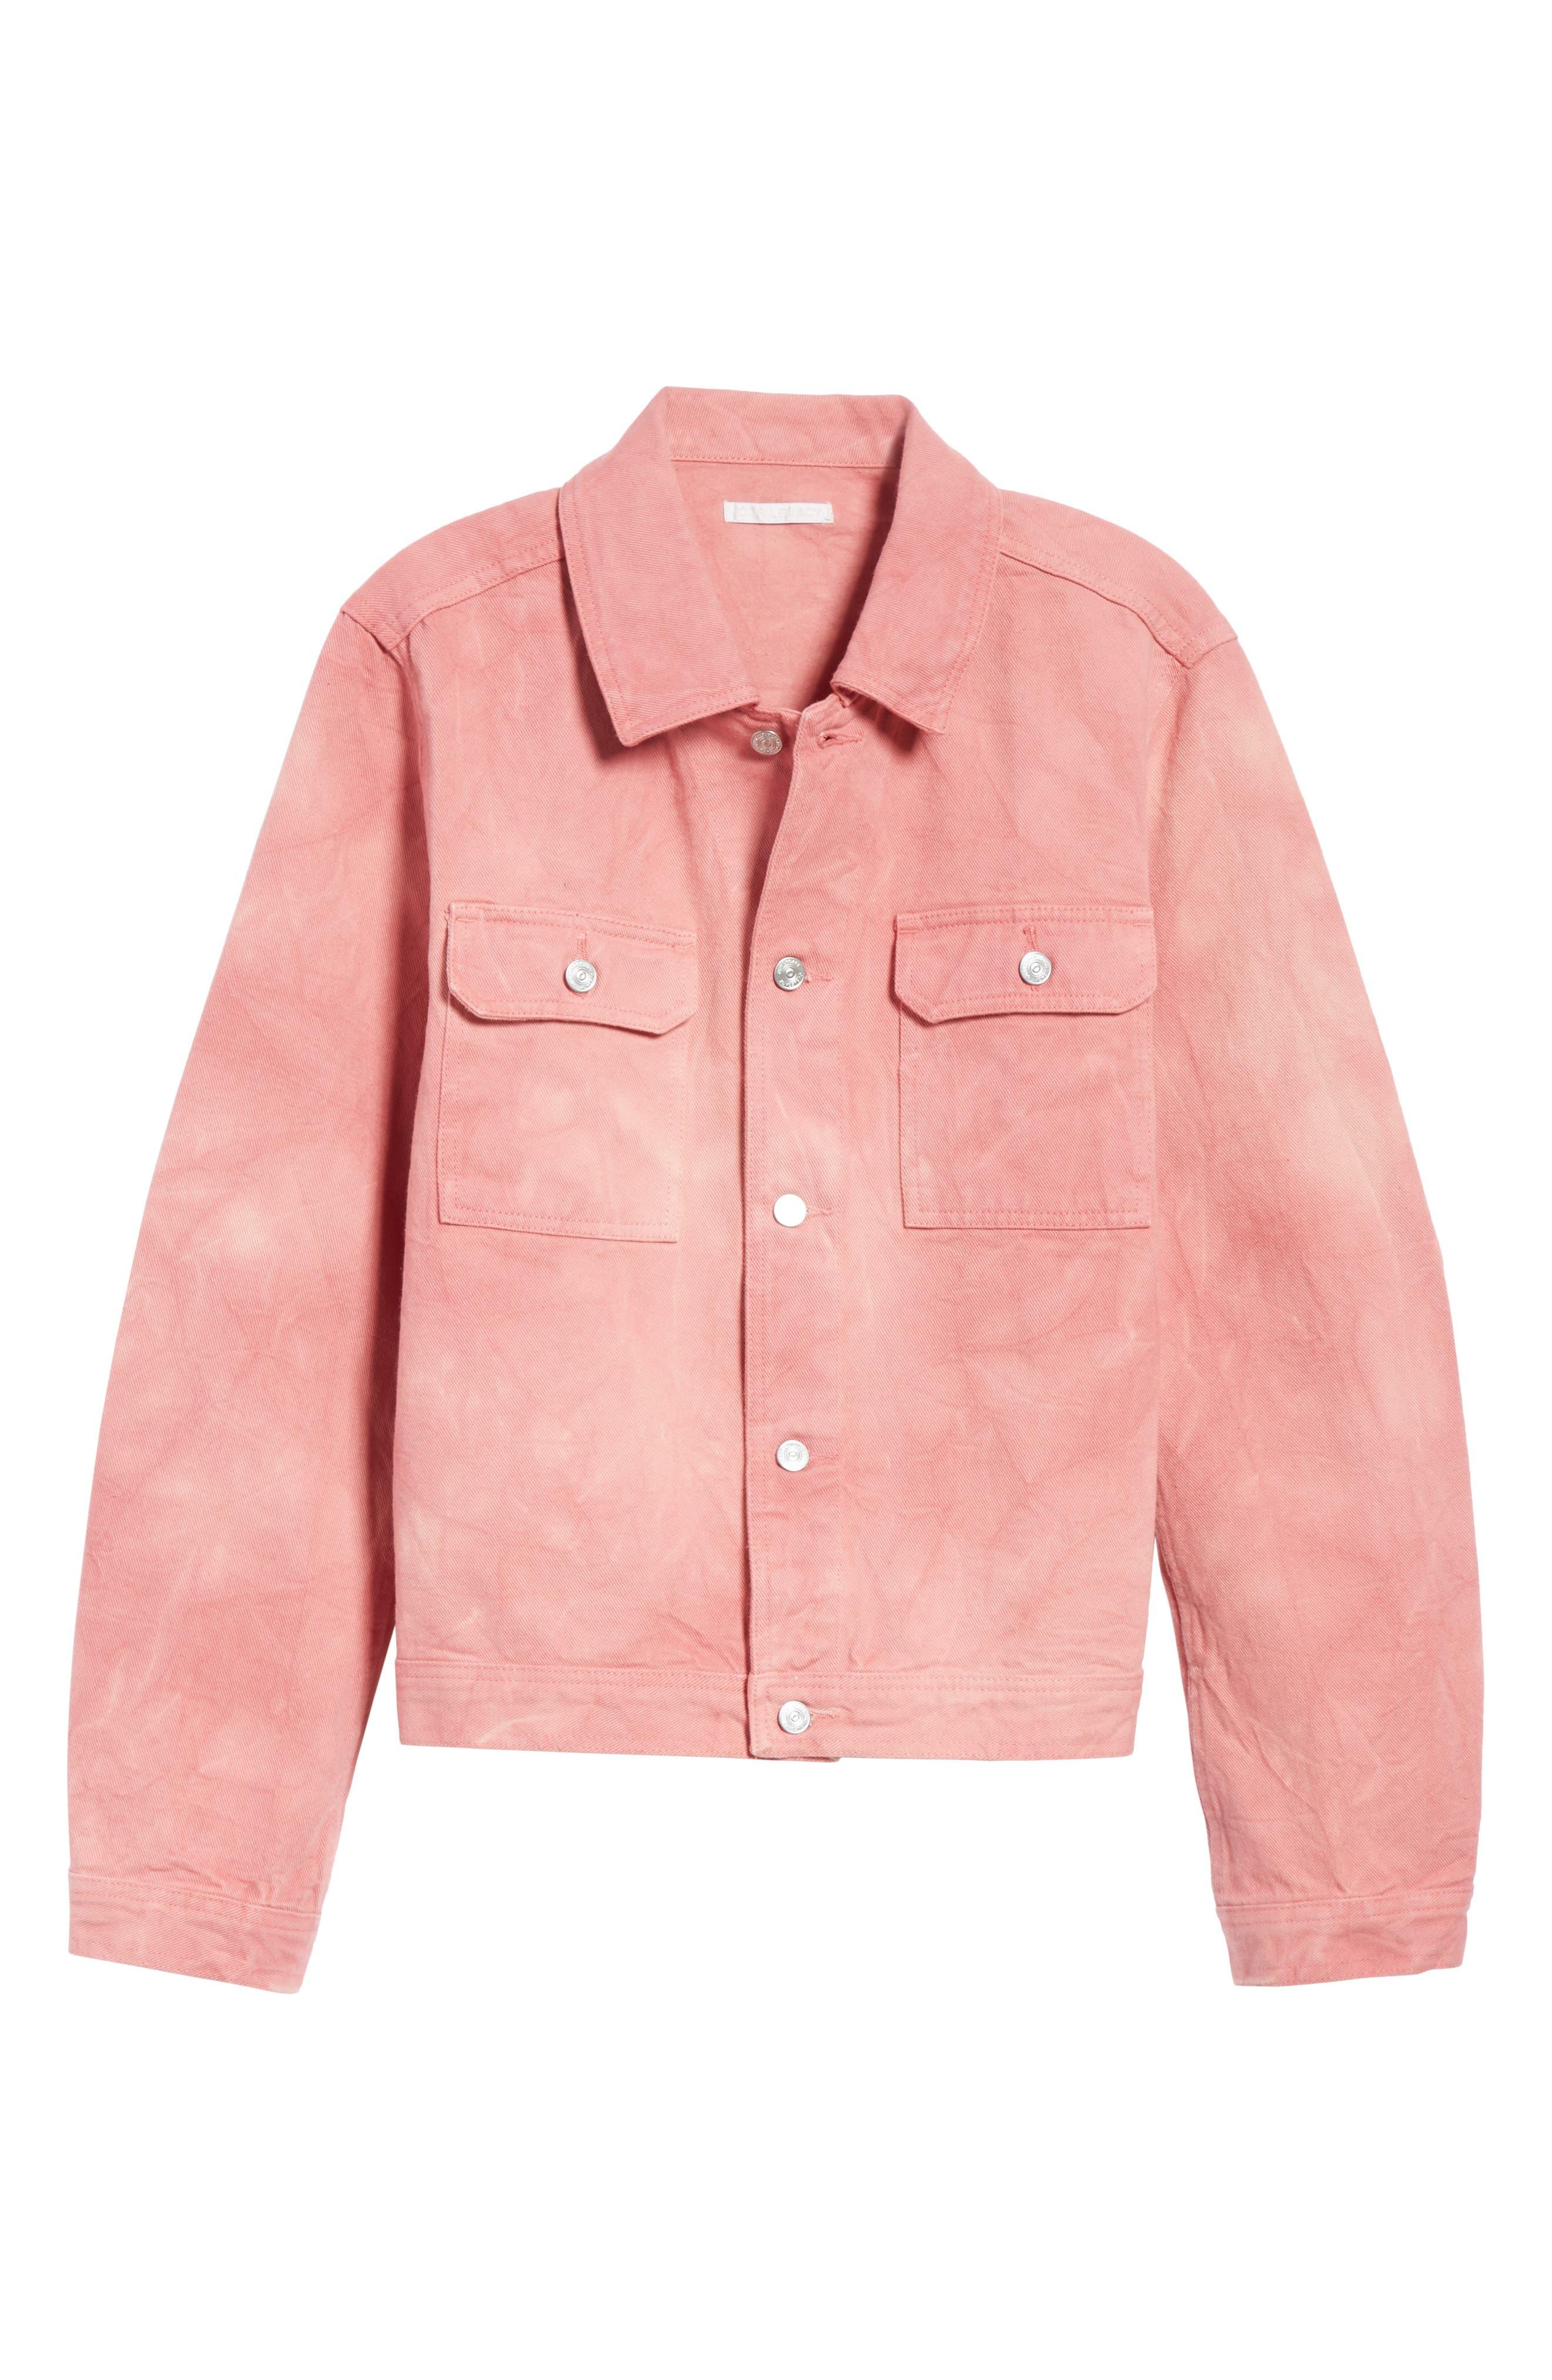 Dye Jacket,                             Alternate thumbnail 6, color,                             Pink